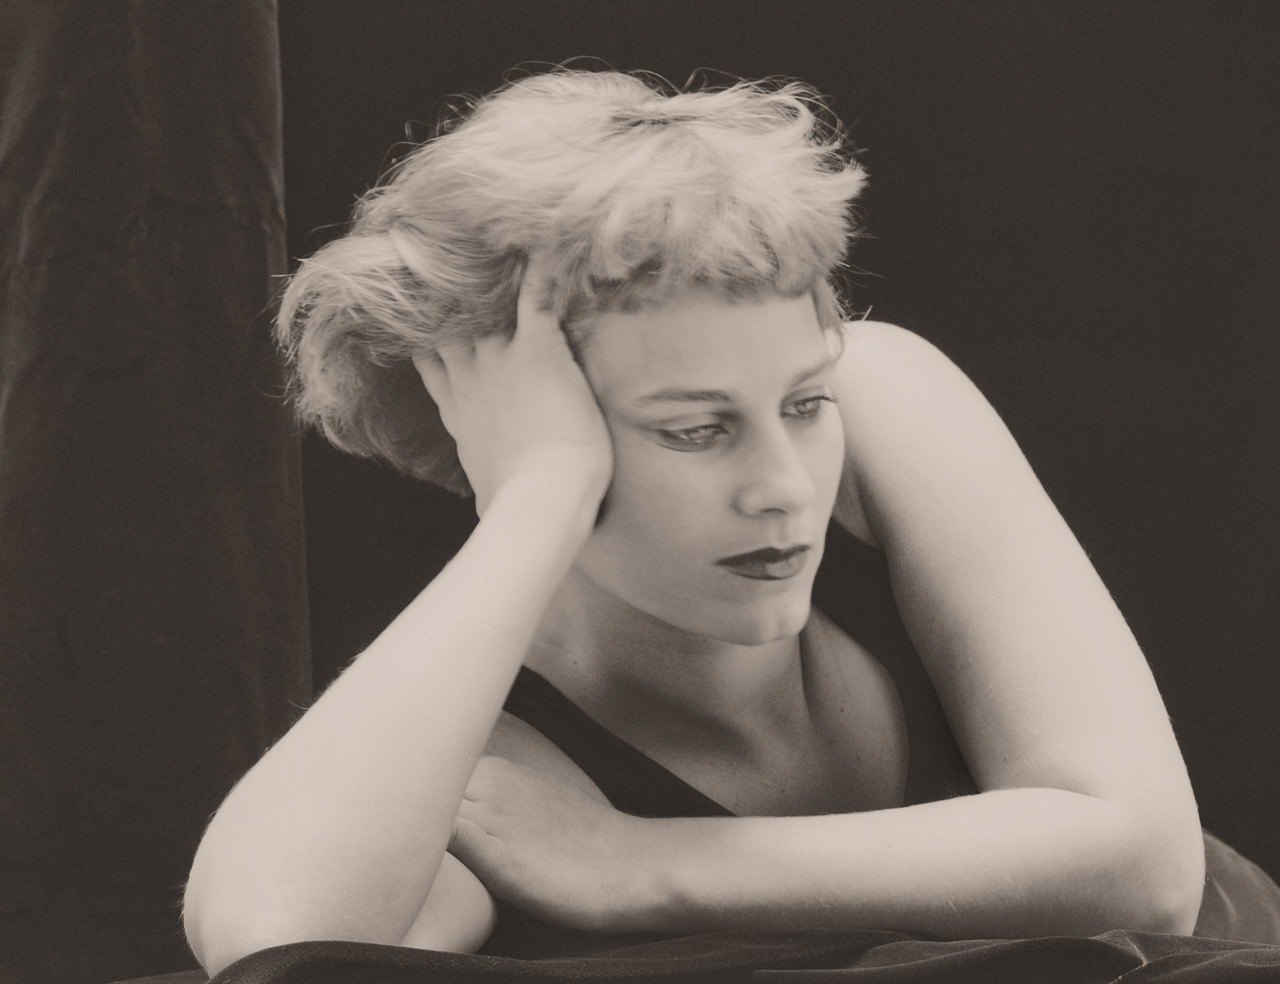 Suzanne Potts 1, 1986